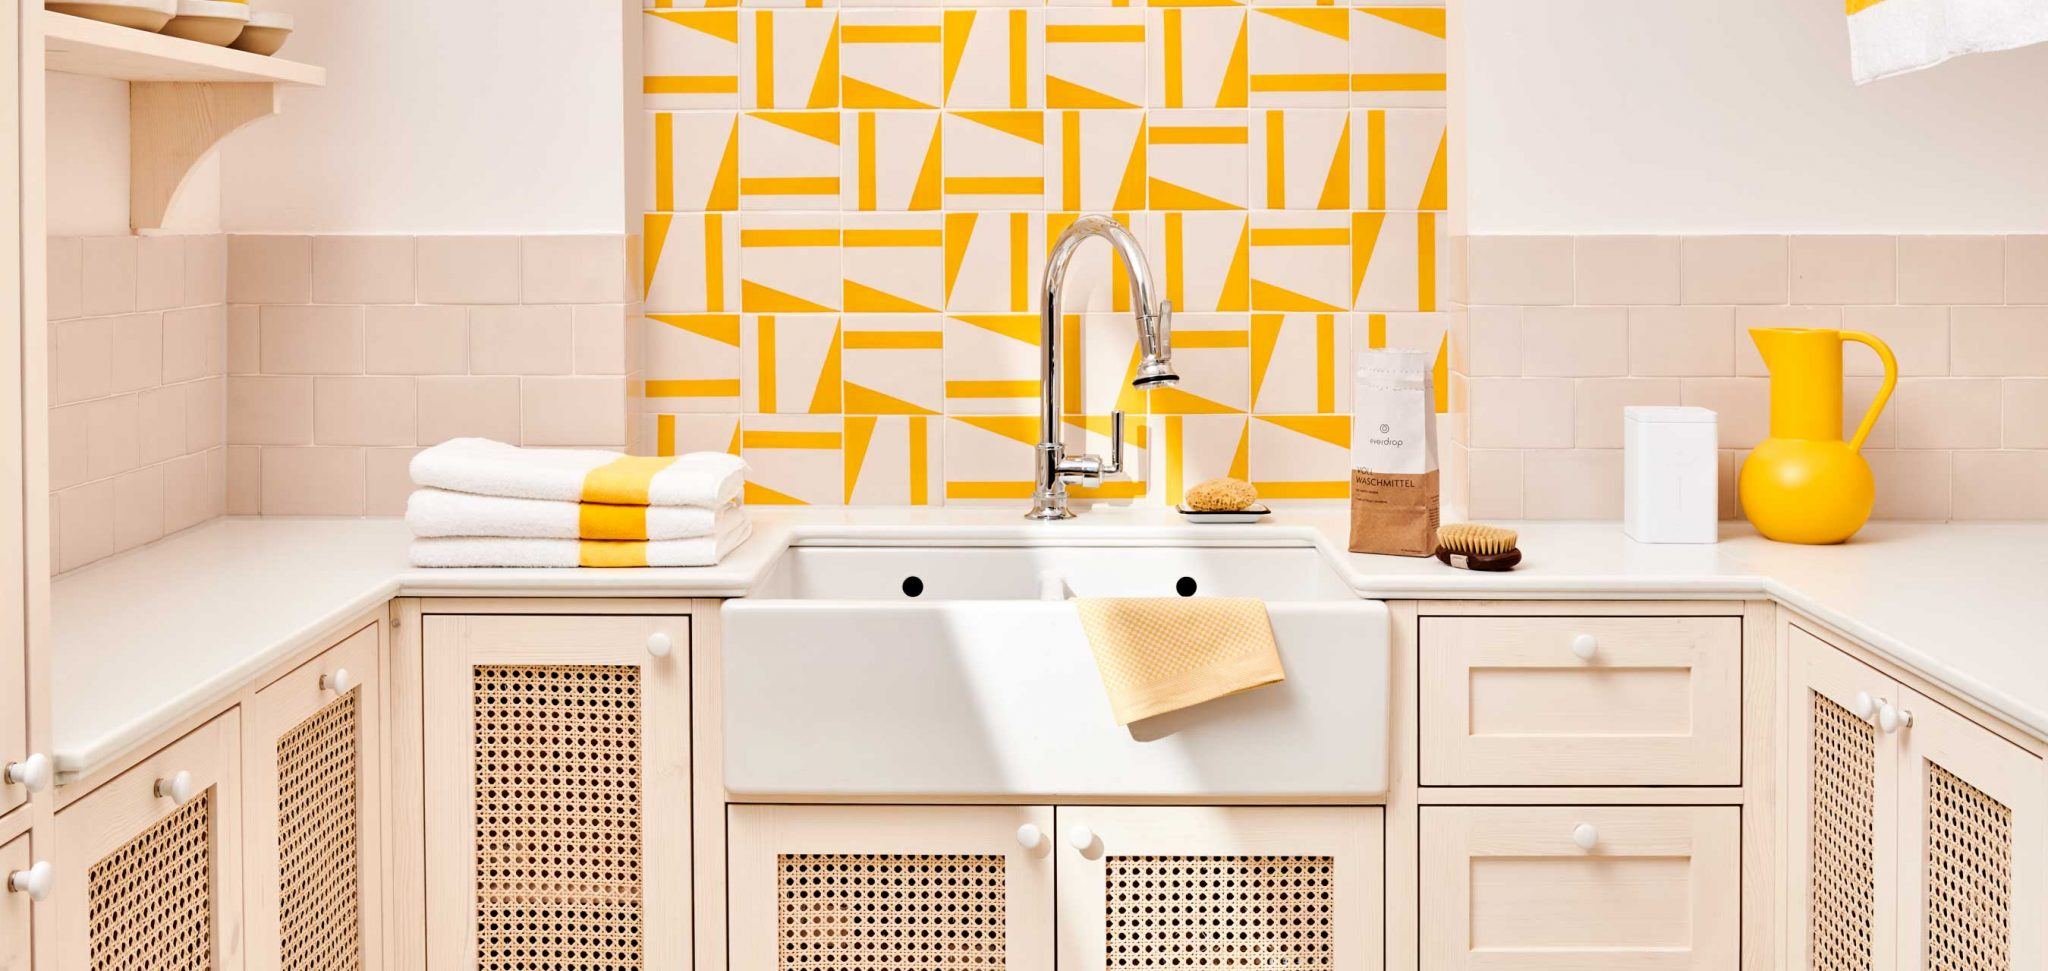 laundry gelb weiß